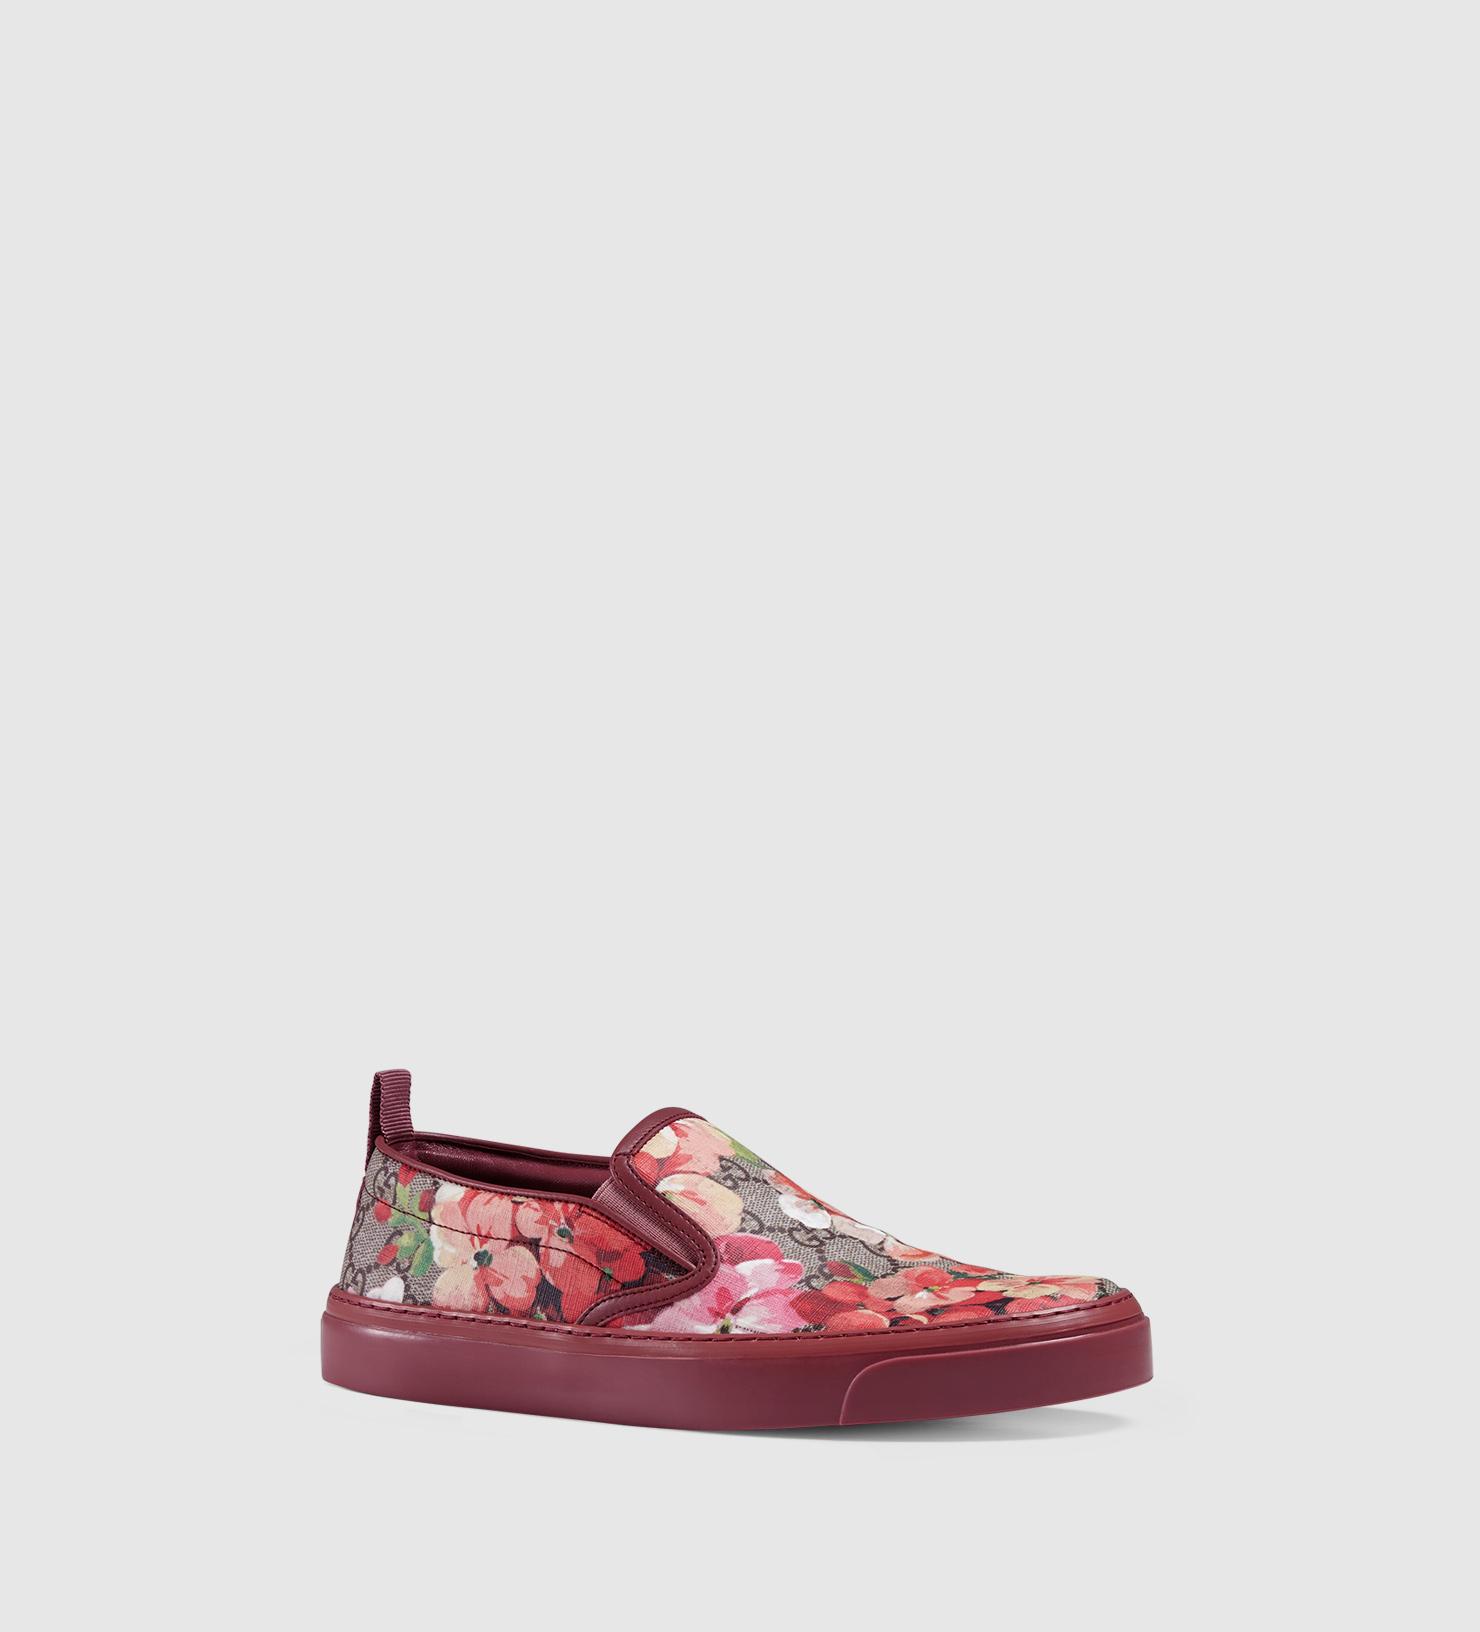 1e2cd6355aa Lyst - Gucci Blooms Print Slip-on Sneaker